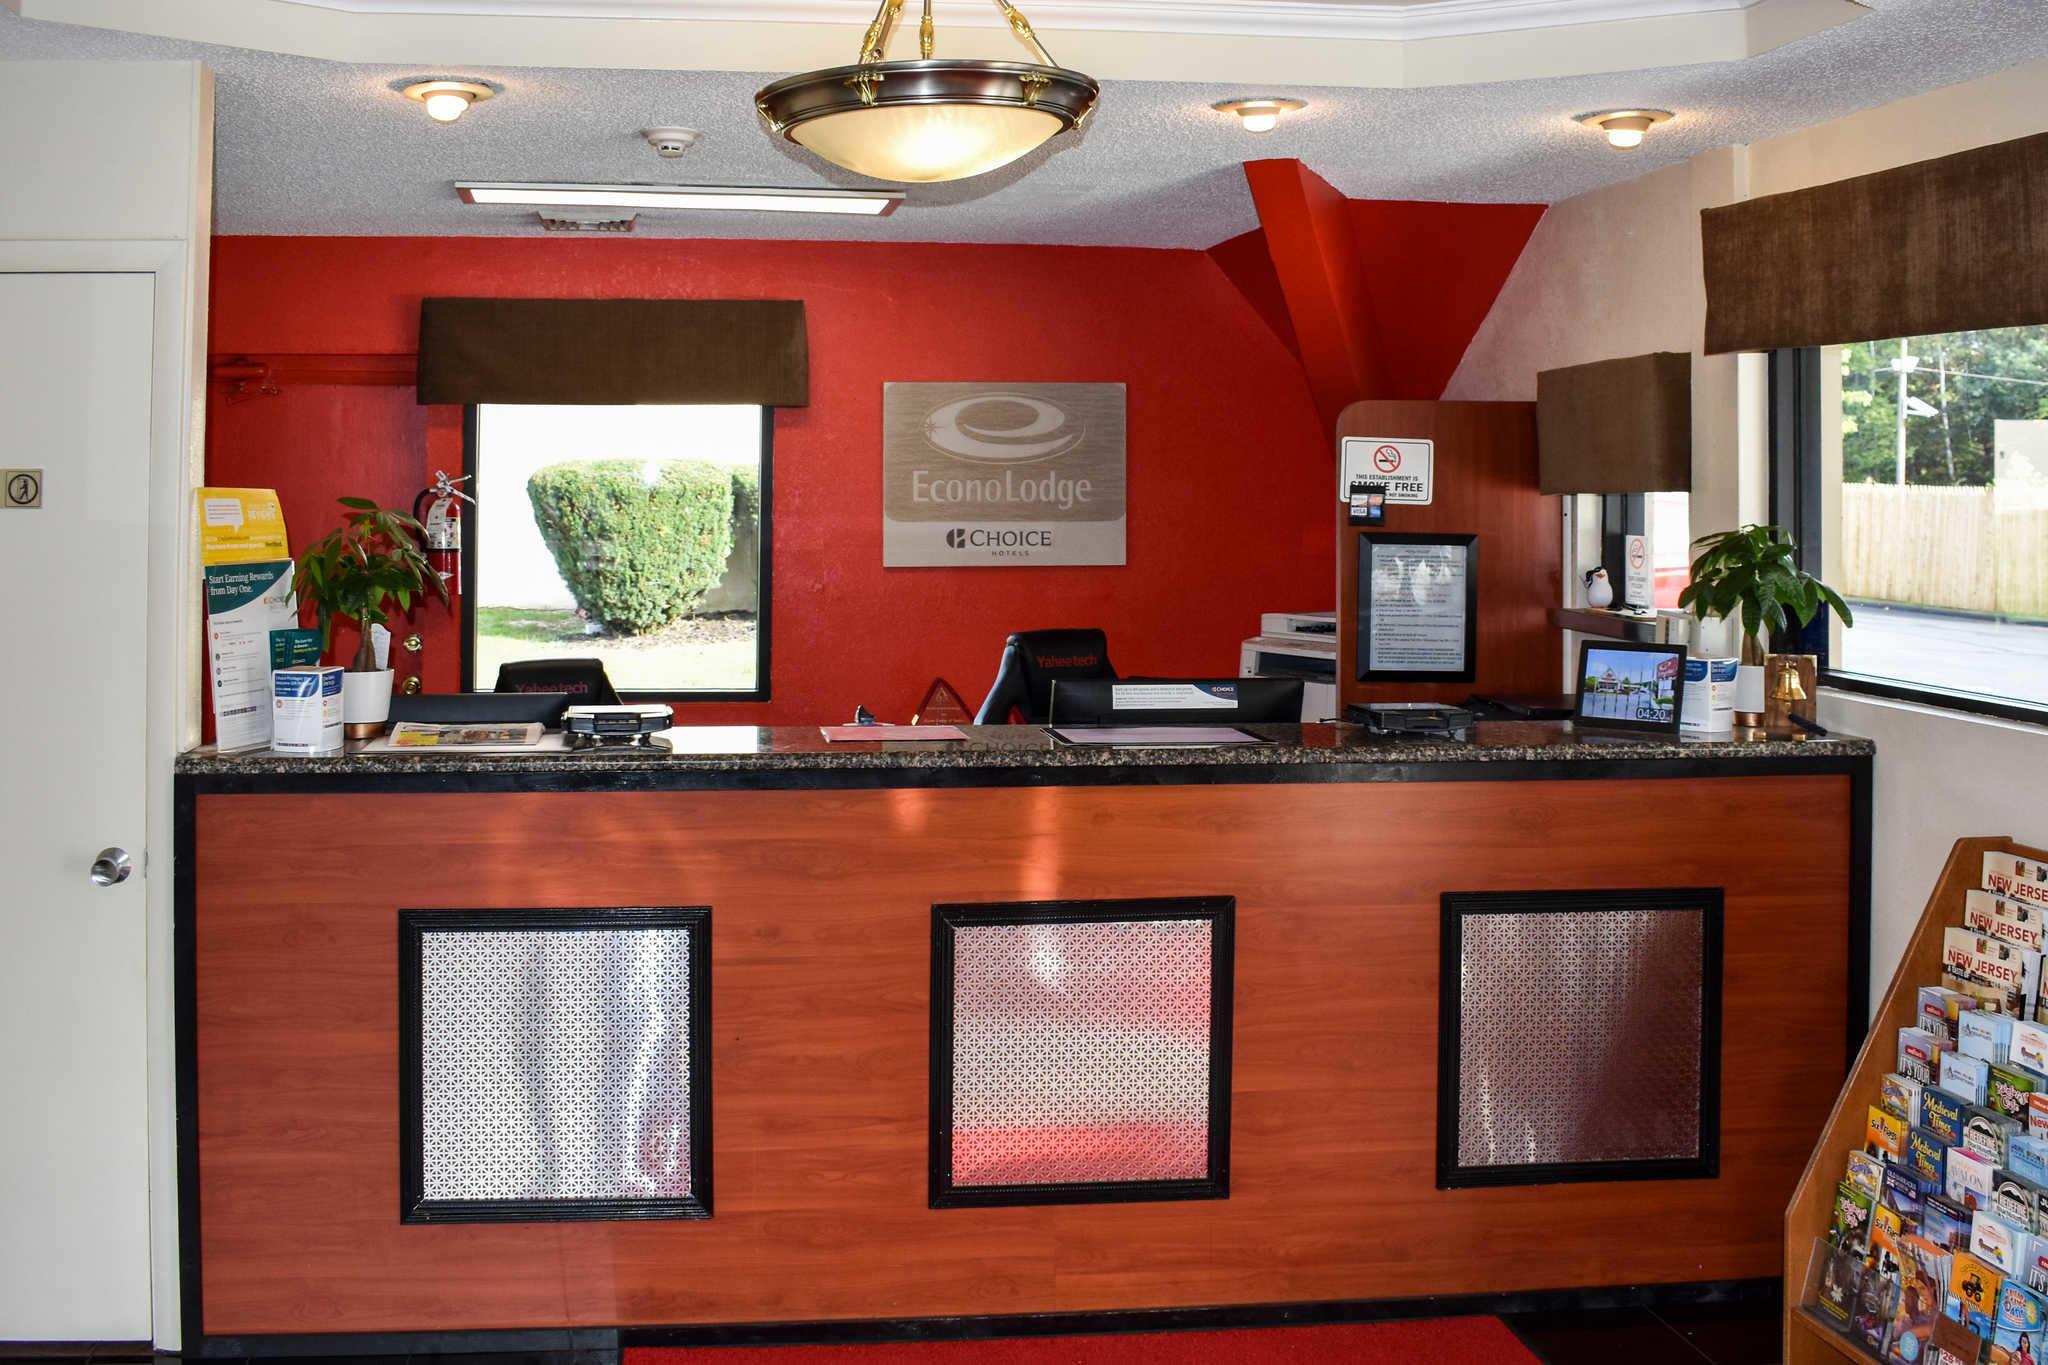 Econo Lodge Inn & Suites - Closed image 10